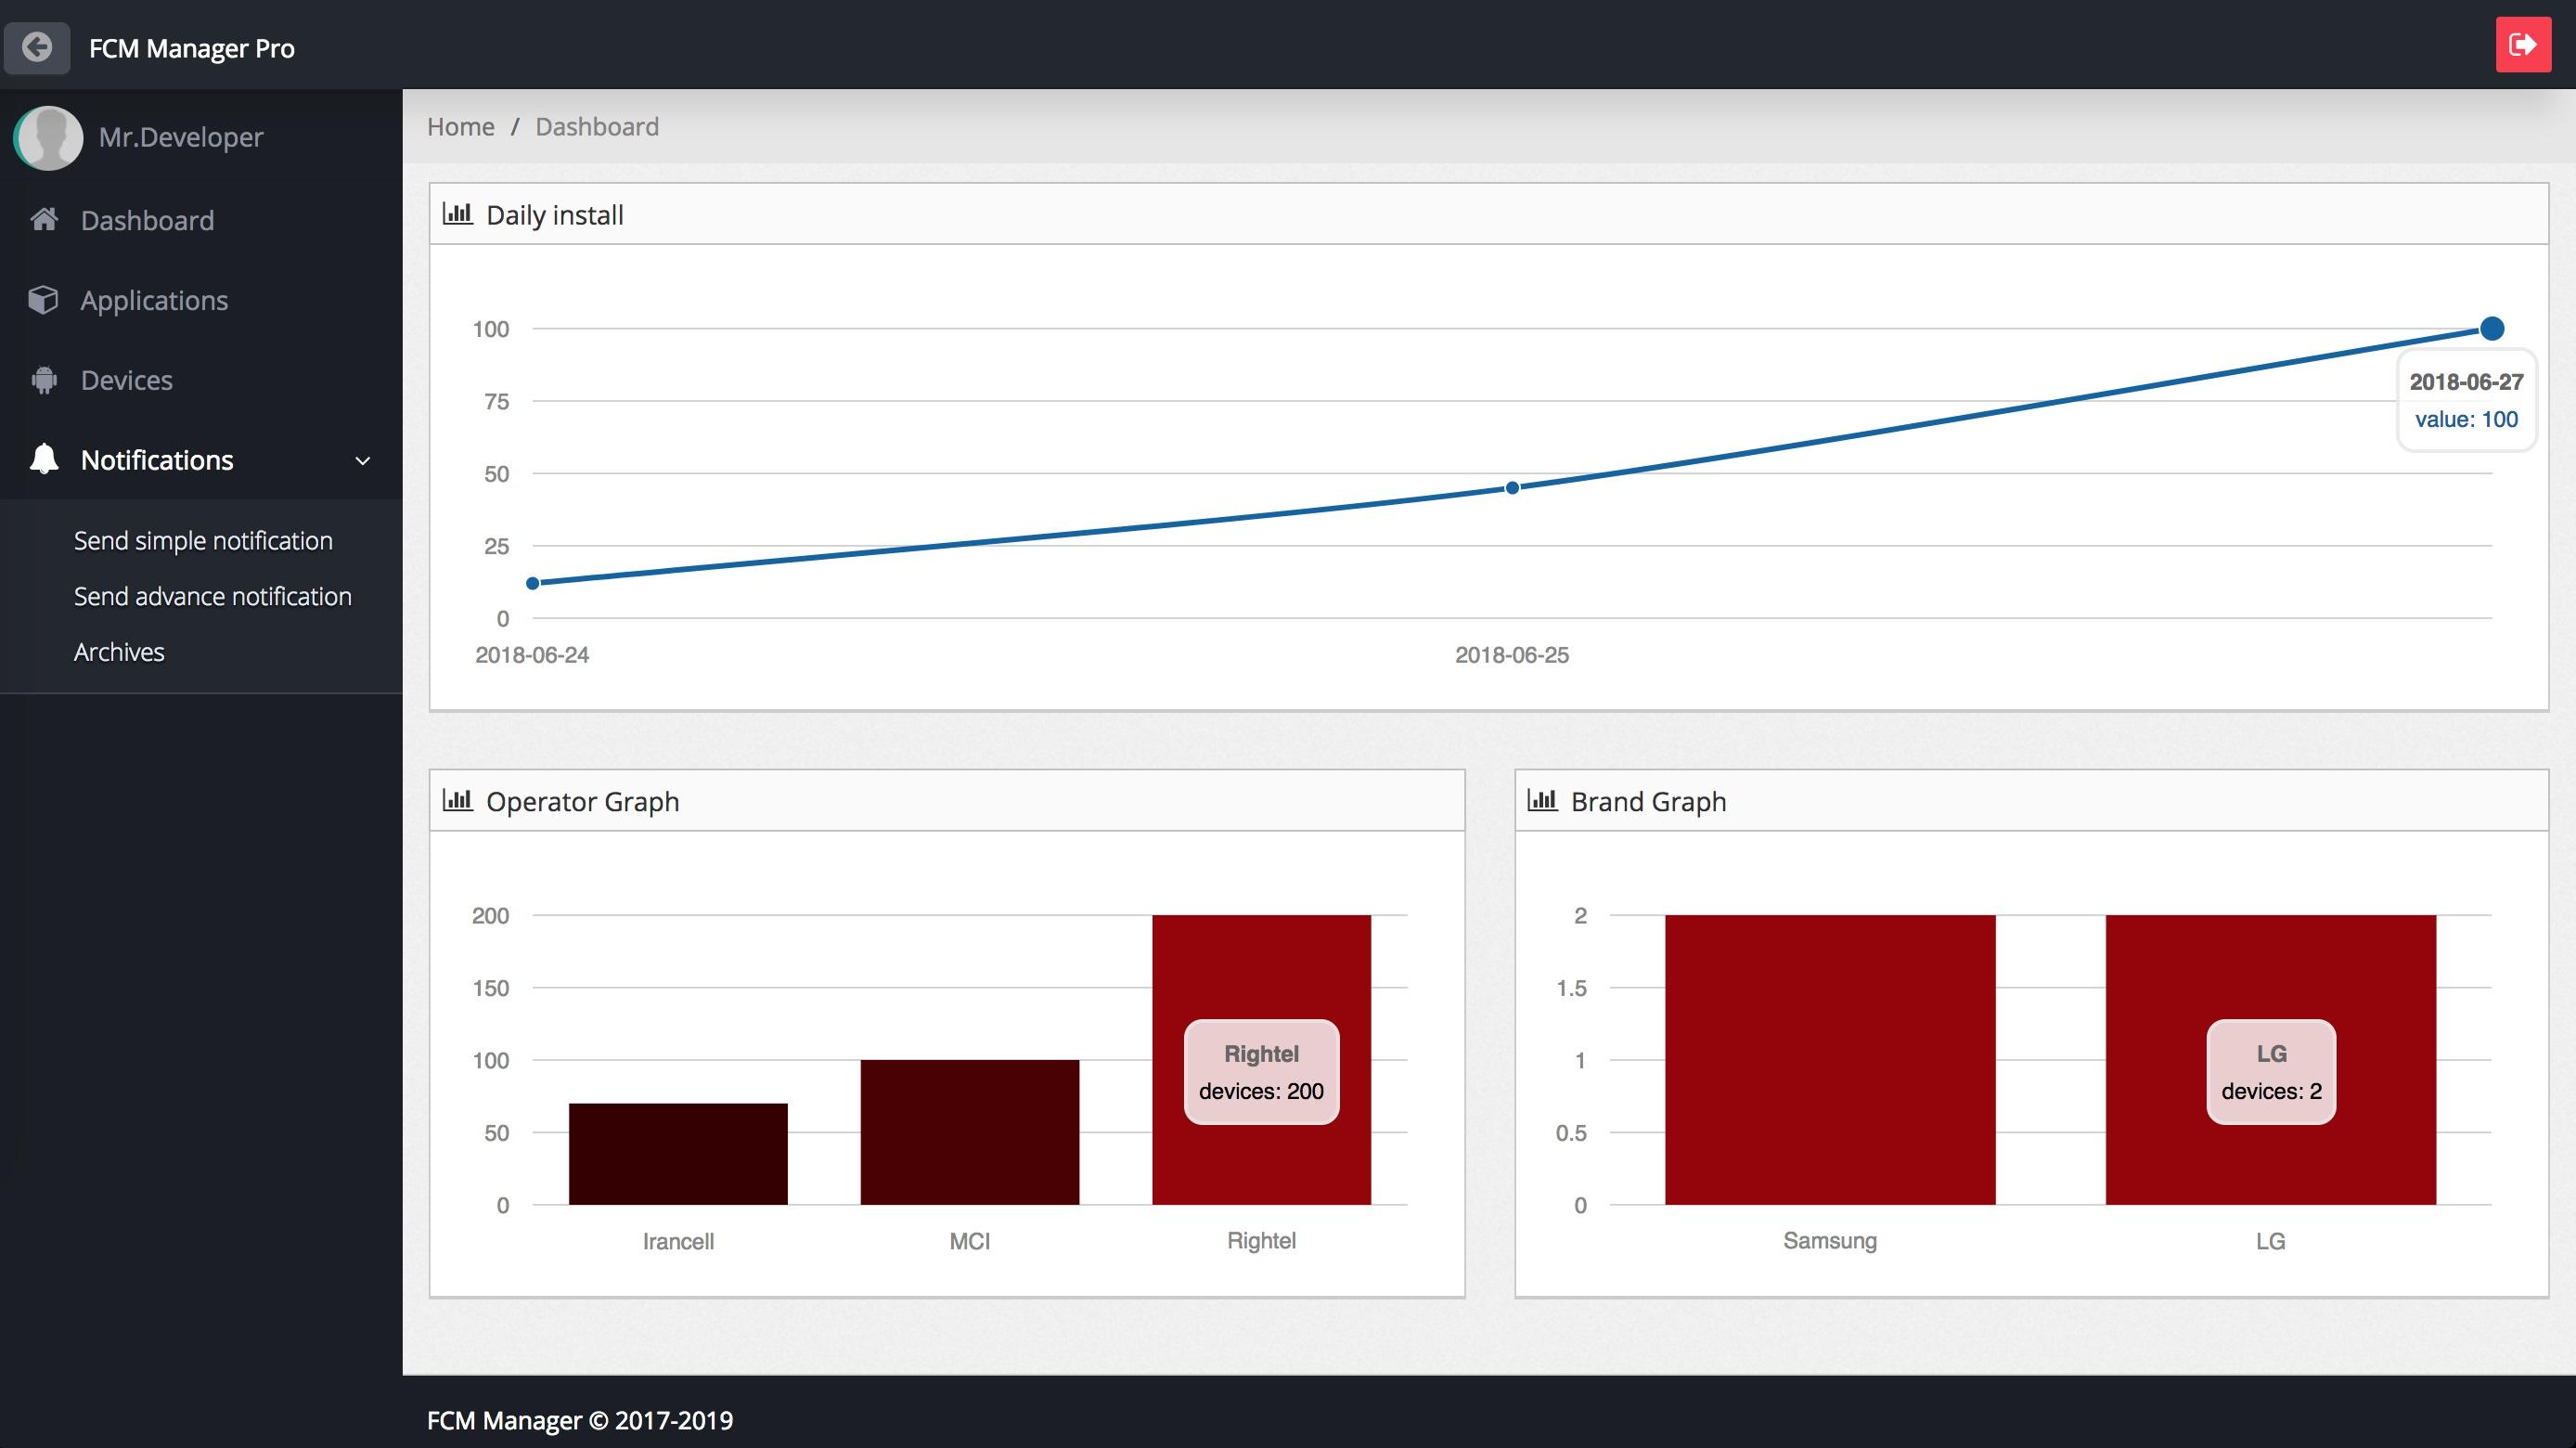 dashboard - اسکریپت پنل پوش نوتیفیکیشن حرفه ای فایربیس   ارسال ۱۱ نوع نوتیفیکیشن مختلف